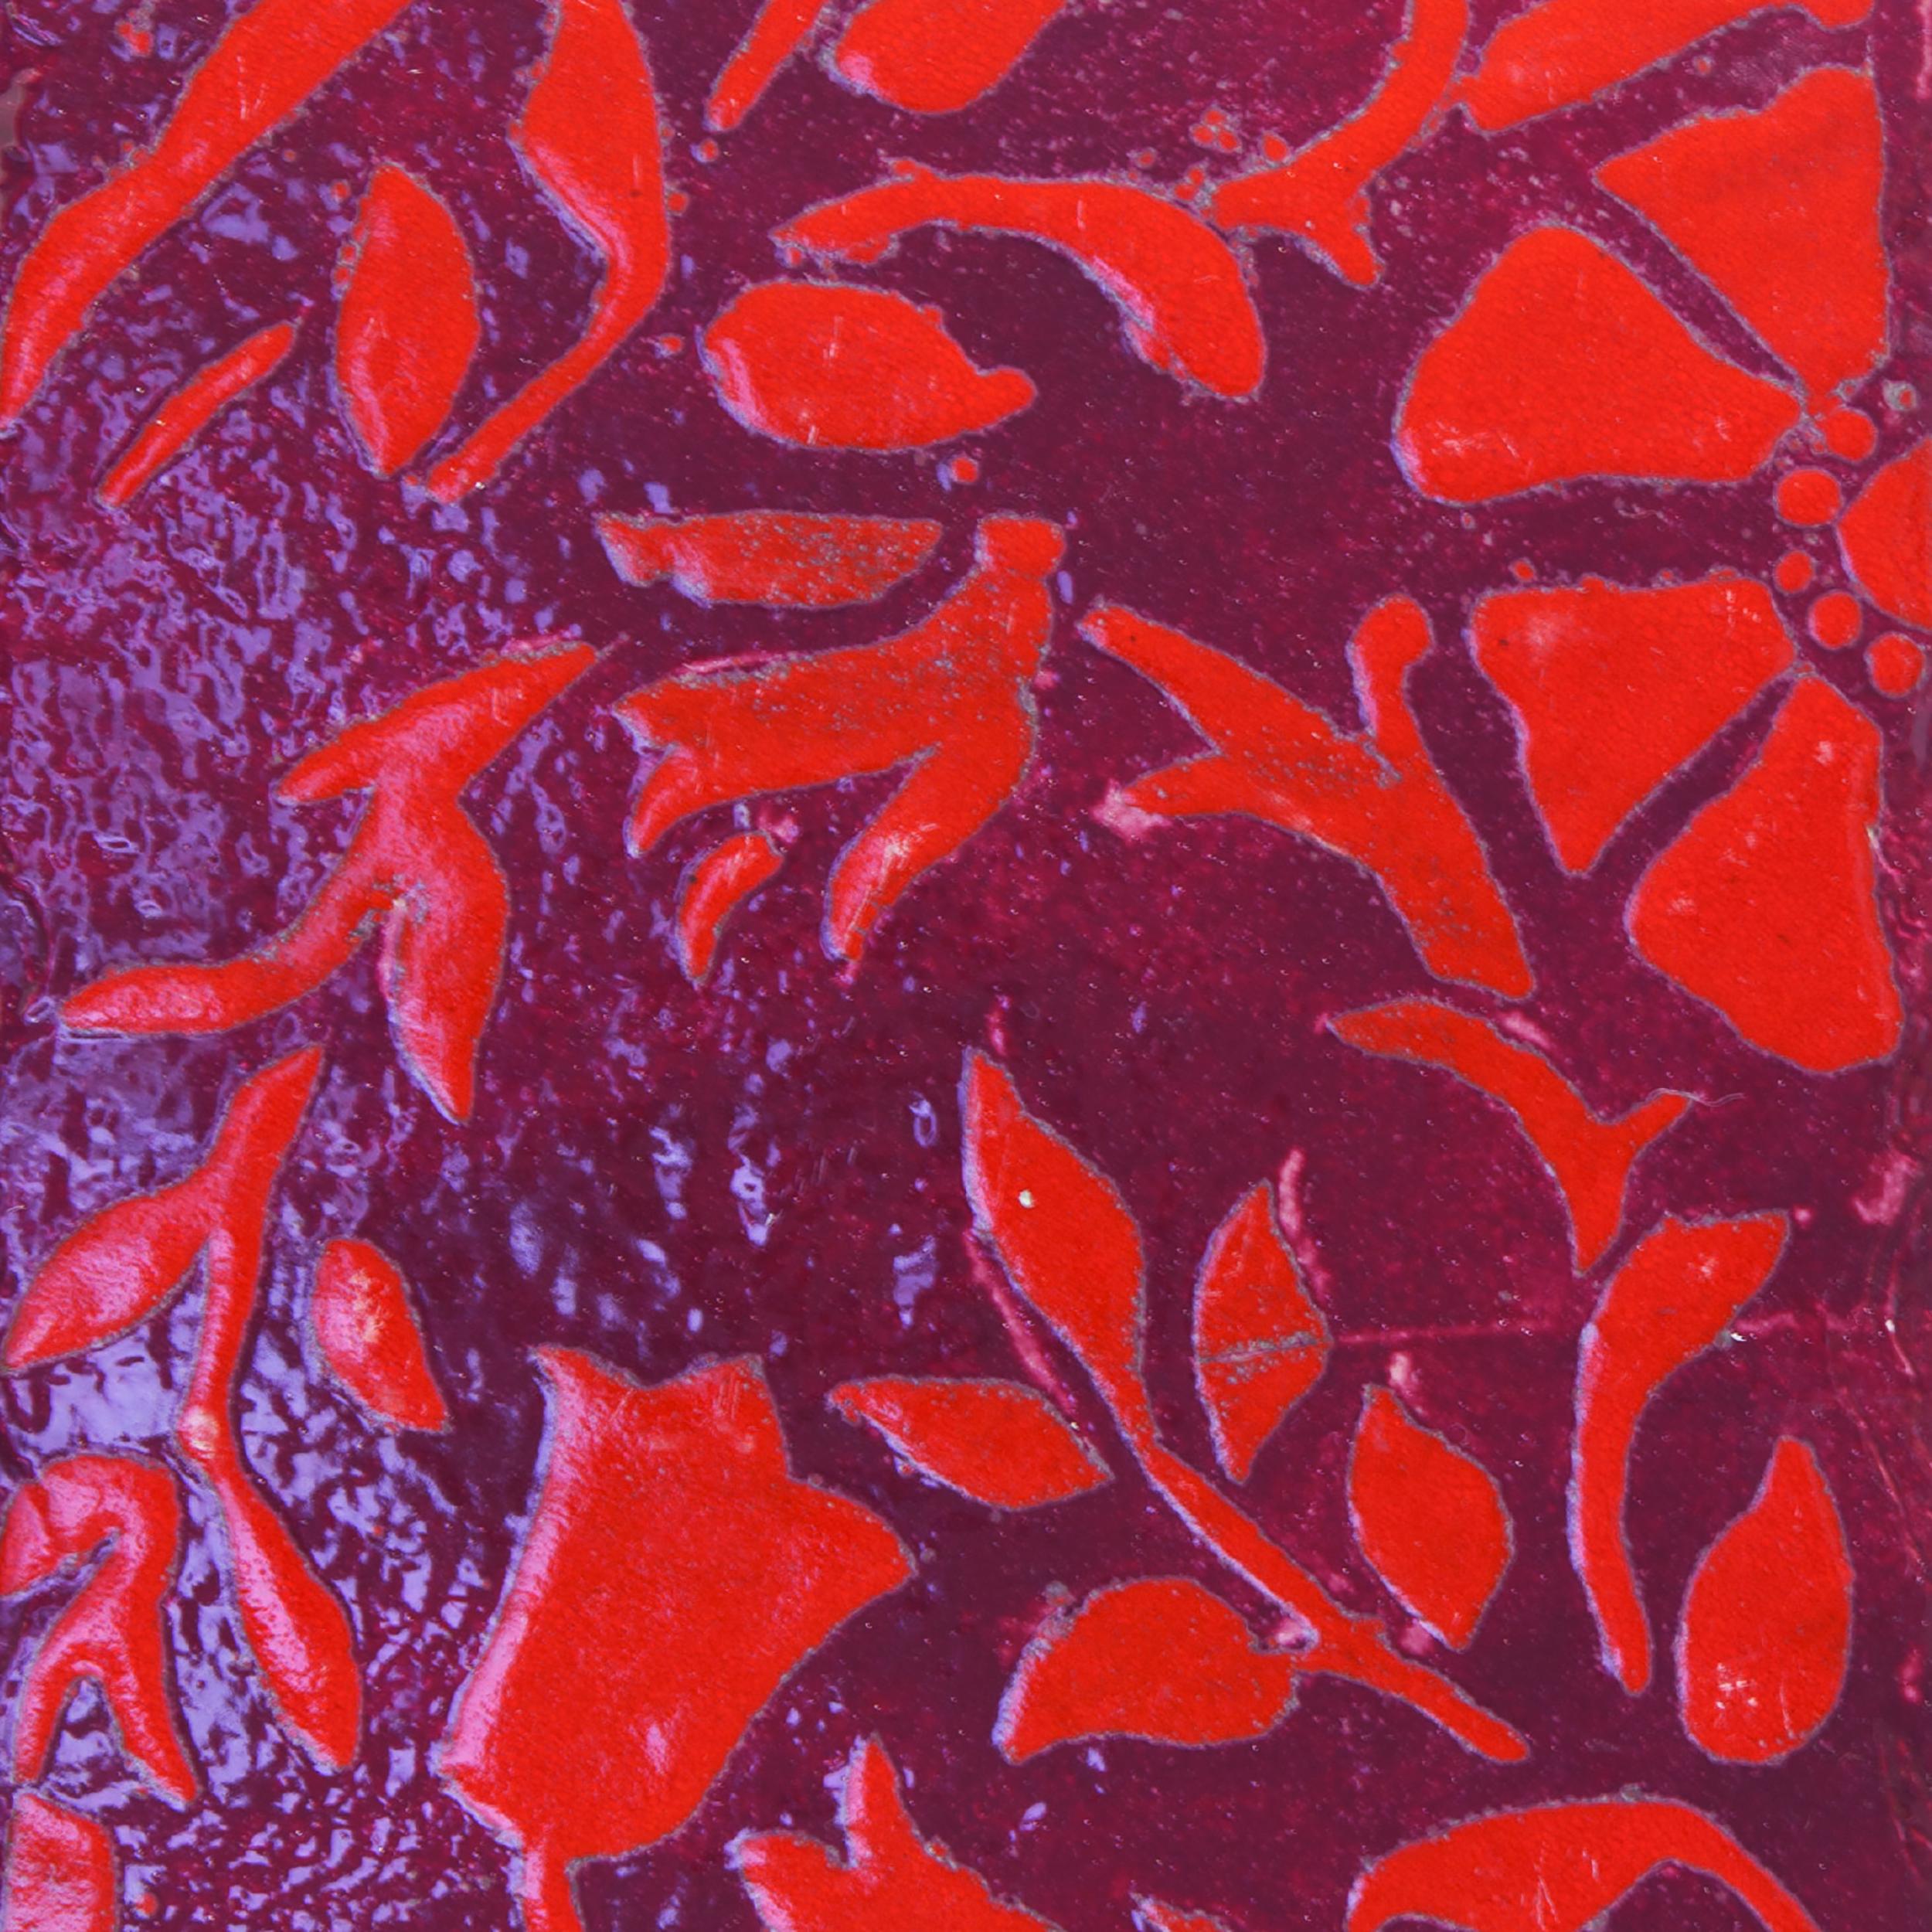 Square Tiles Mix Decorations -  | Matter of Stuff